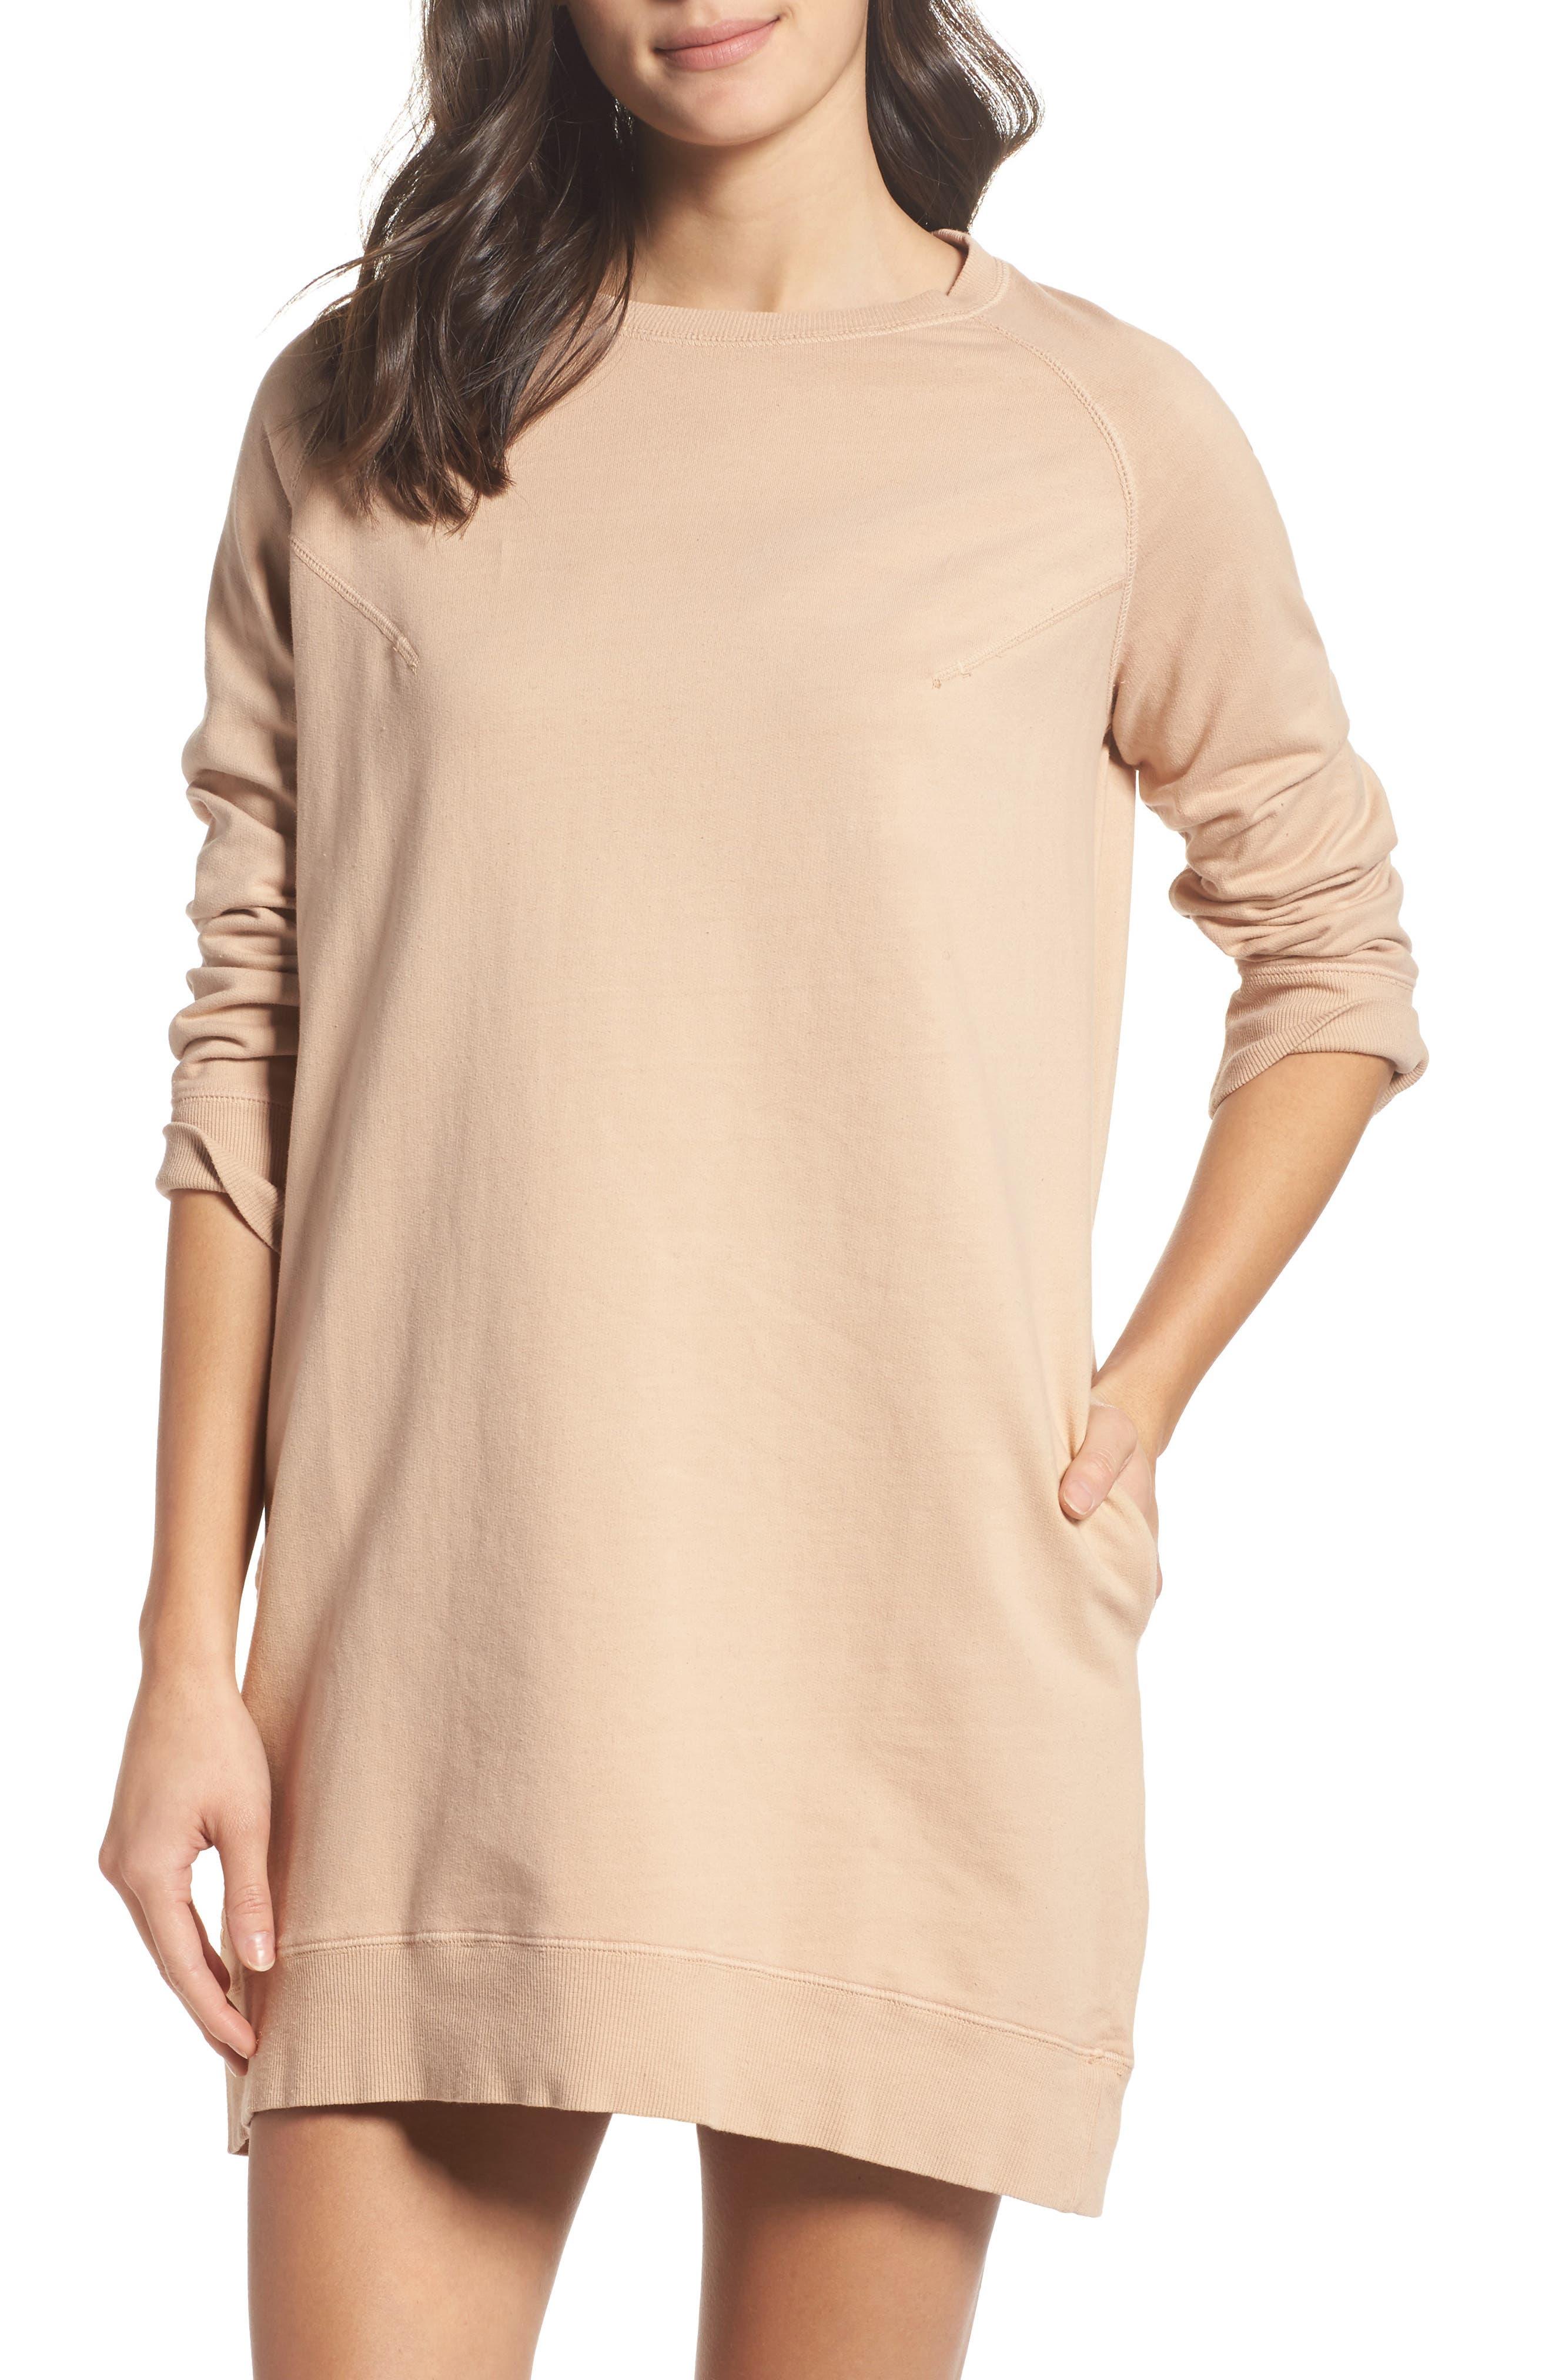 Sweatshirt Dress,                             Main thumbnail 1, color,                             Nude